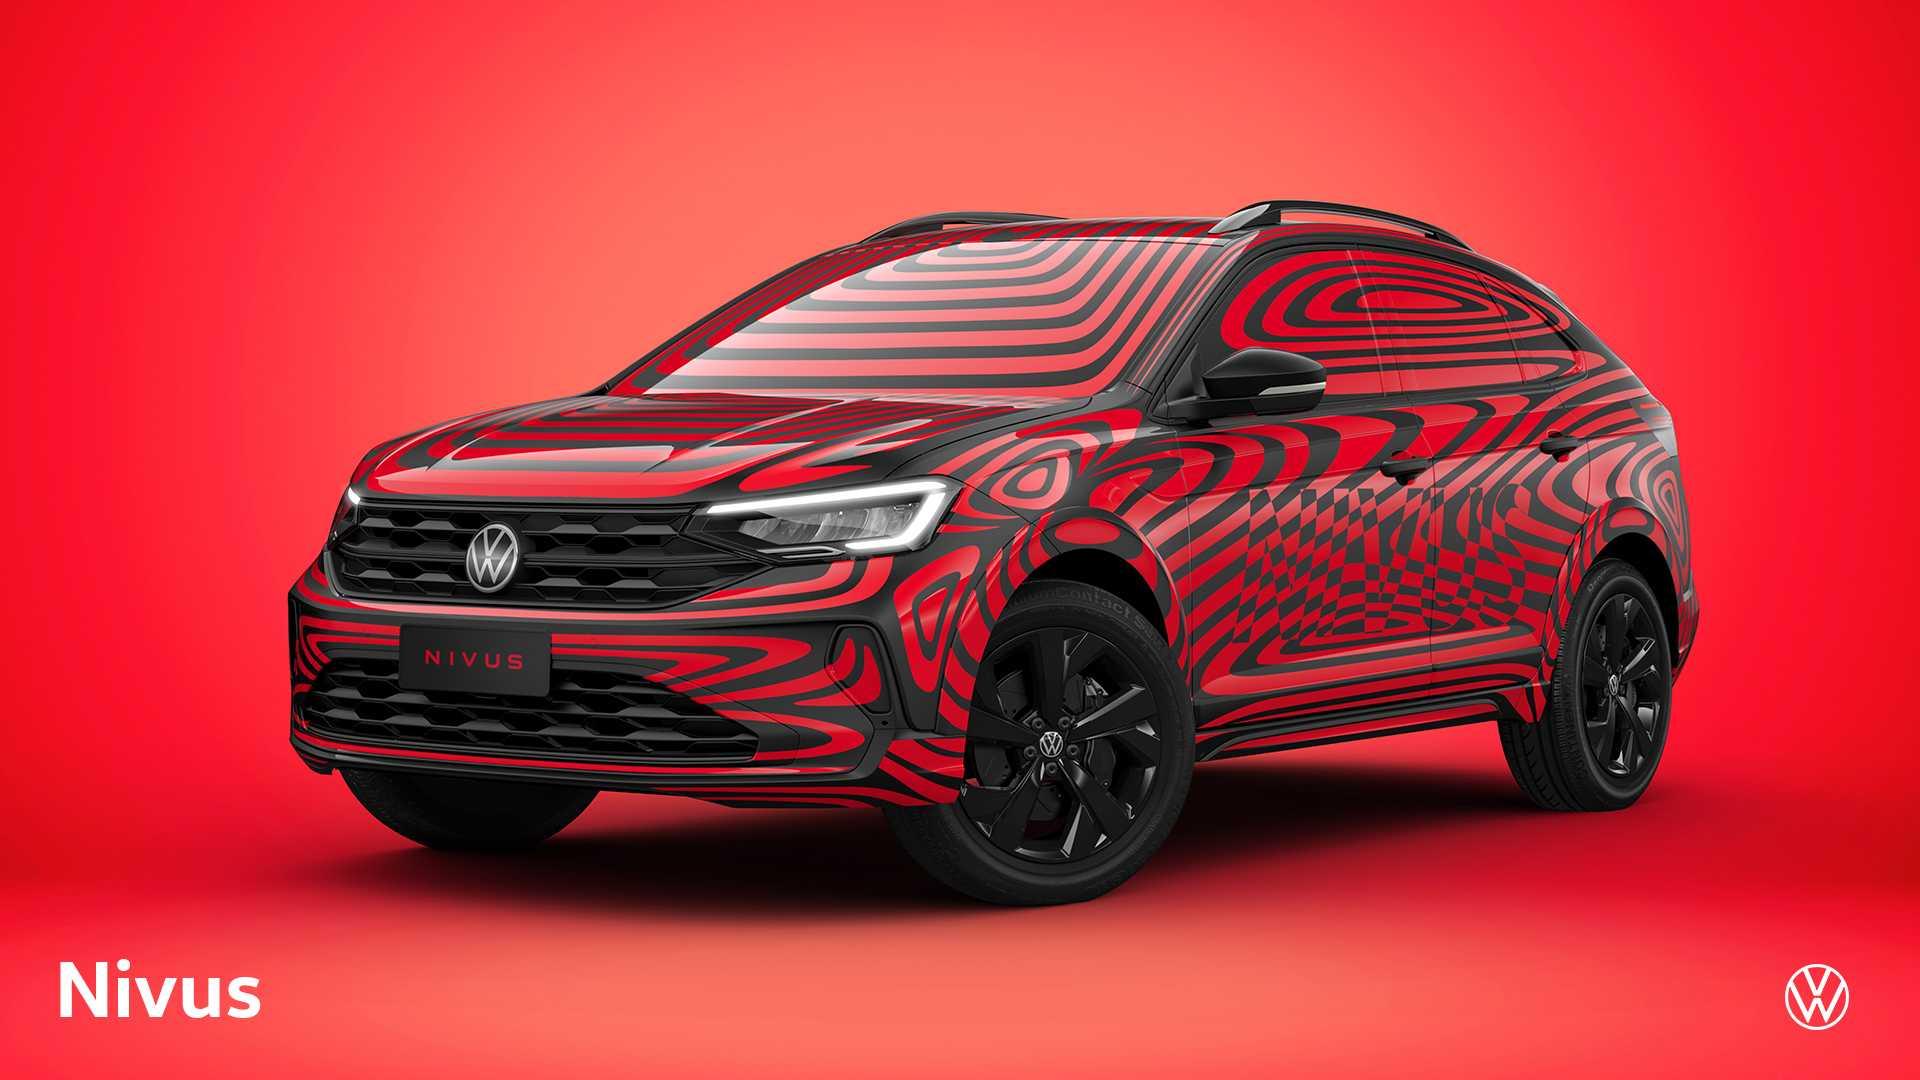 F1体育-采用溜背式设计,大众全新轿跑SUV Nivus官图发布